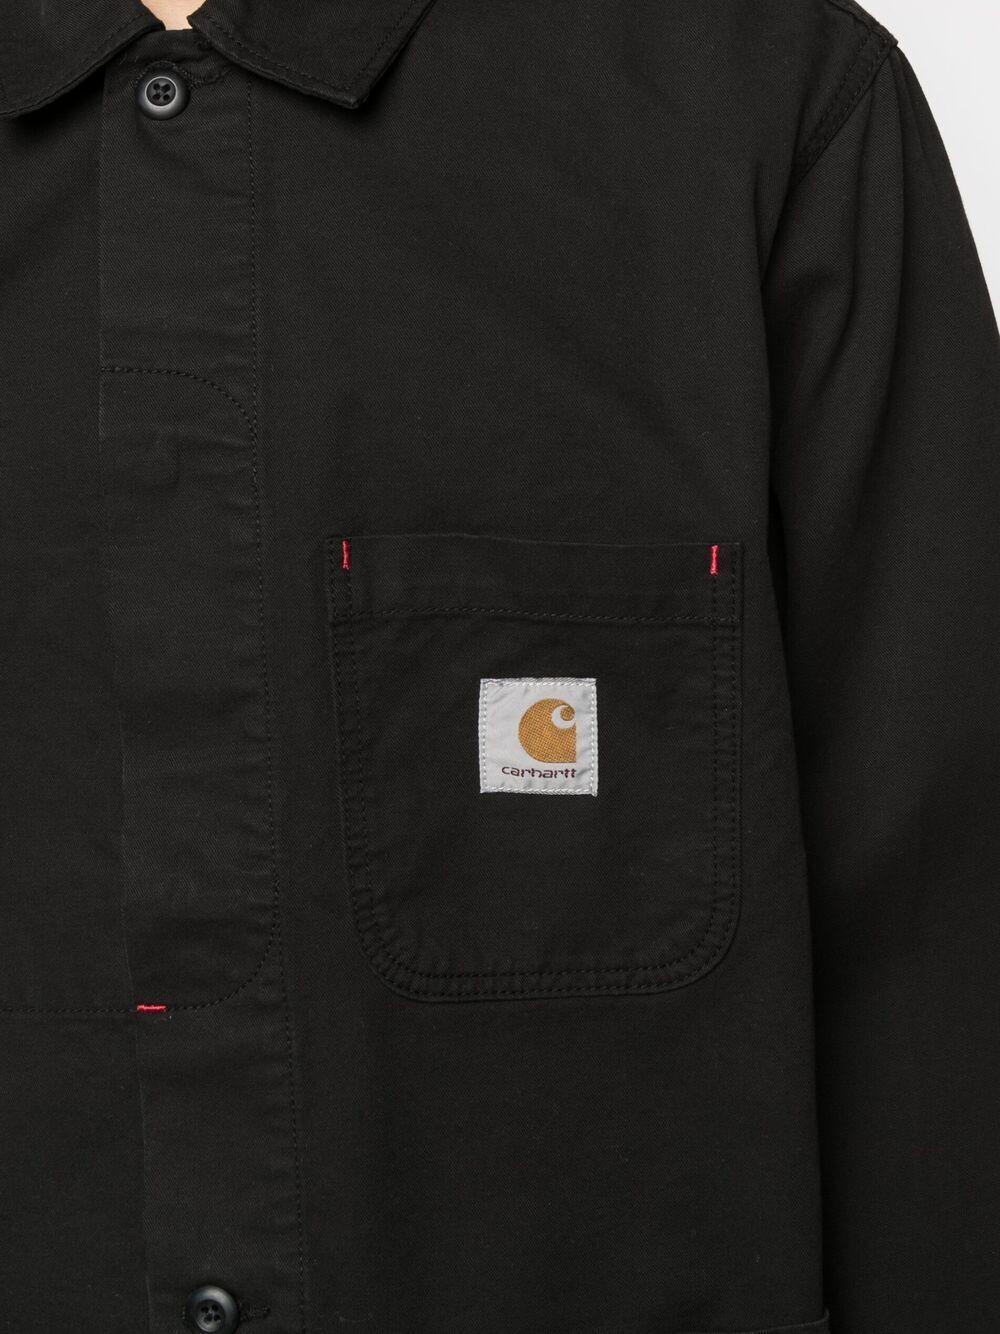 Carhartt wesley jacket uomo CARHARTT WIP   Giacche   I02911989.GD